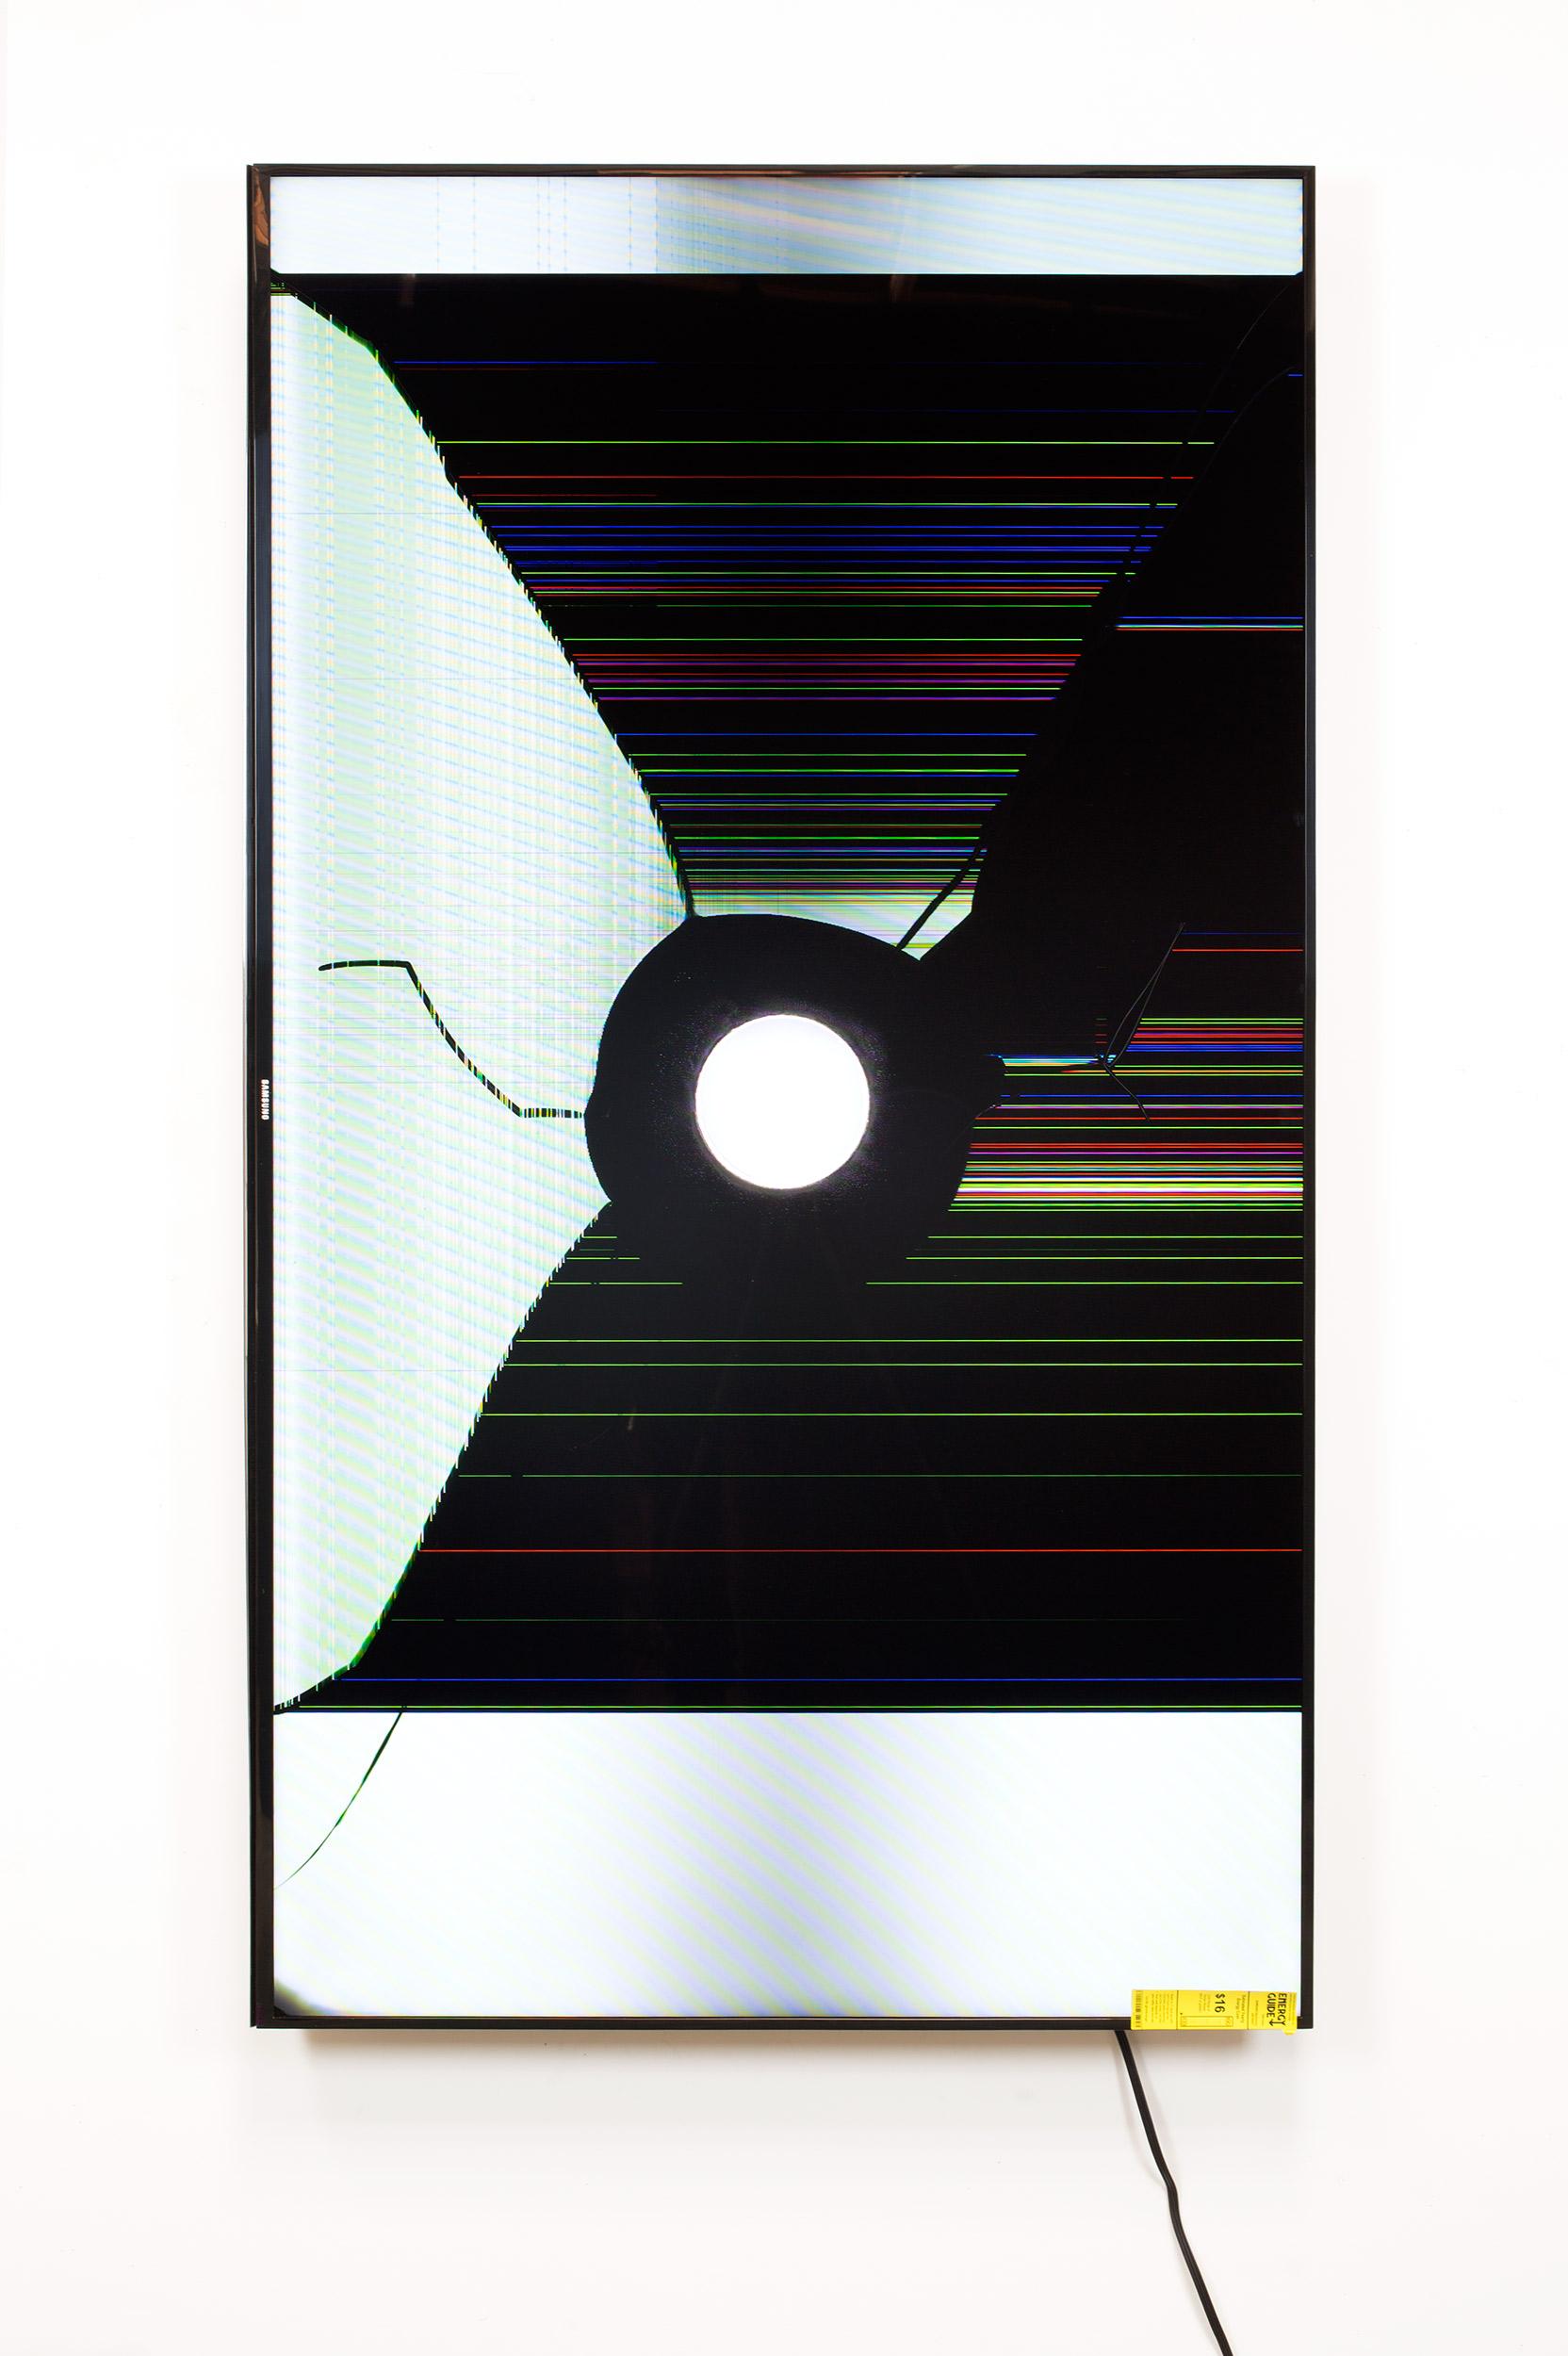 <del>Samsung UN75H6350 75-Inch 120Hz Smart LED TV</del>